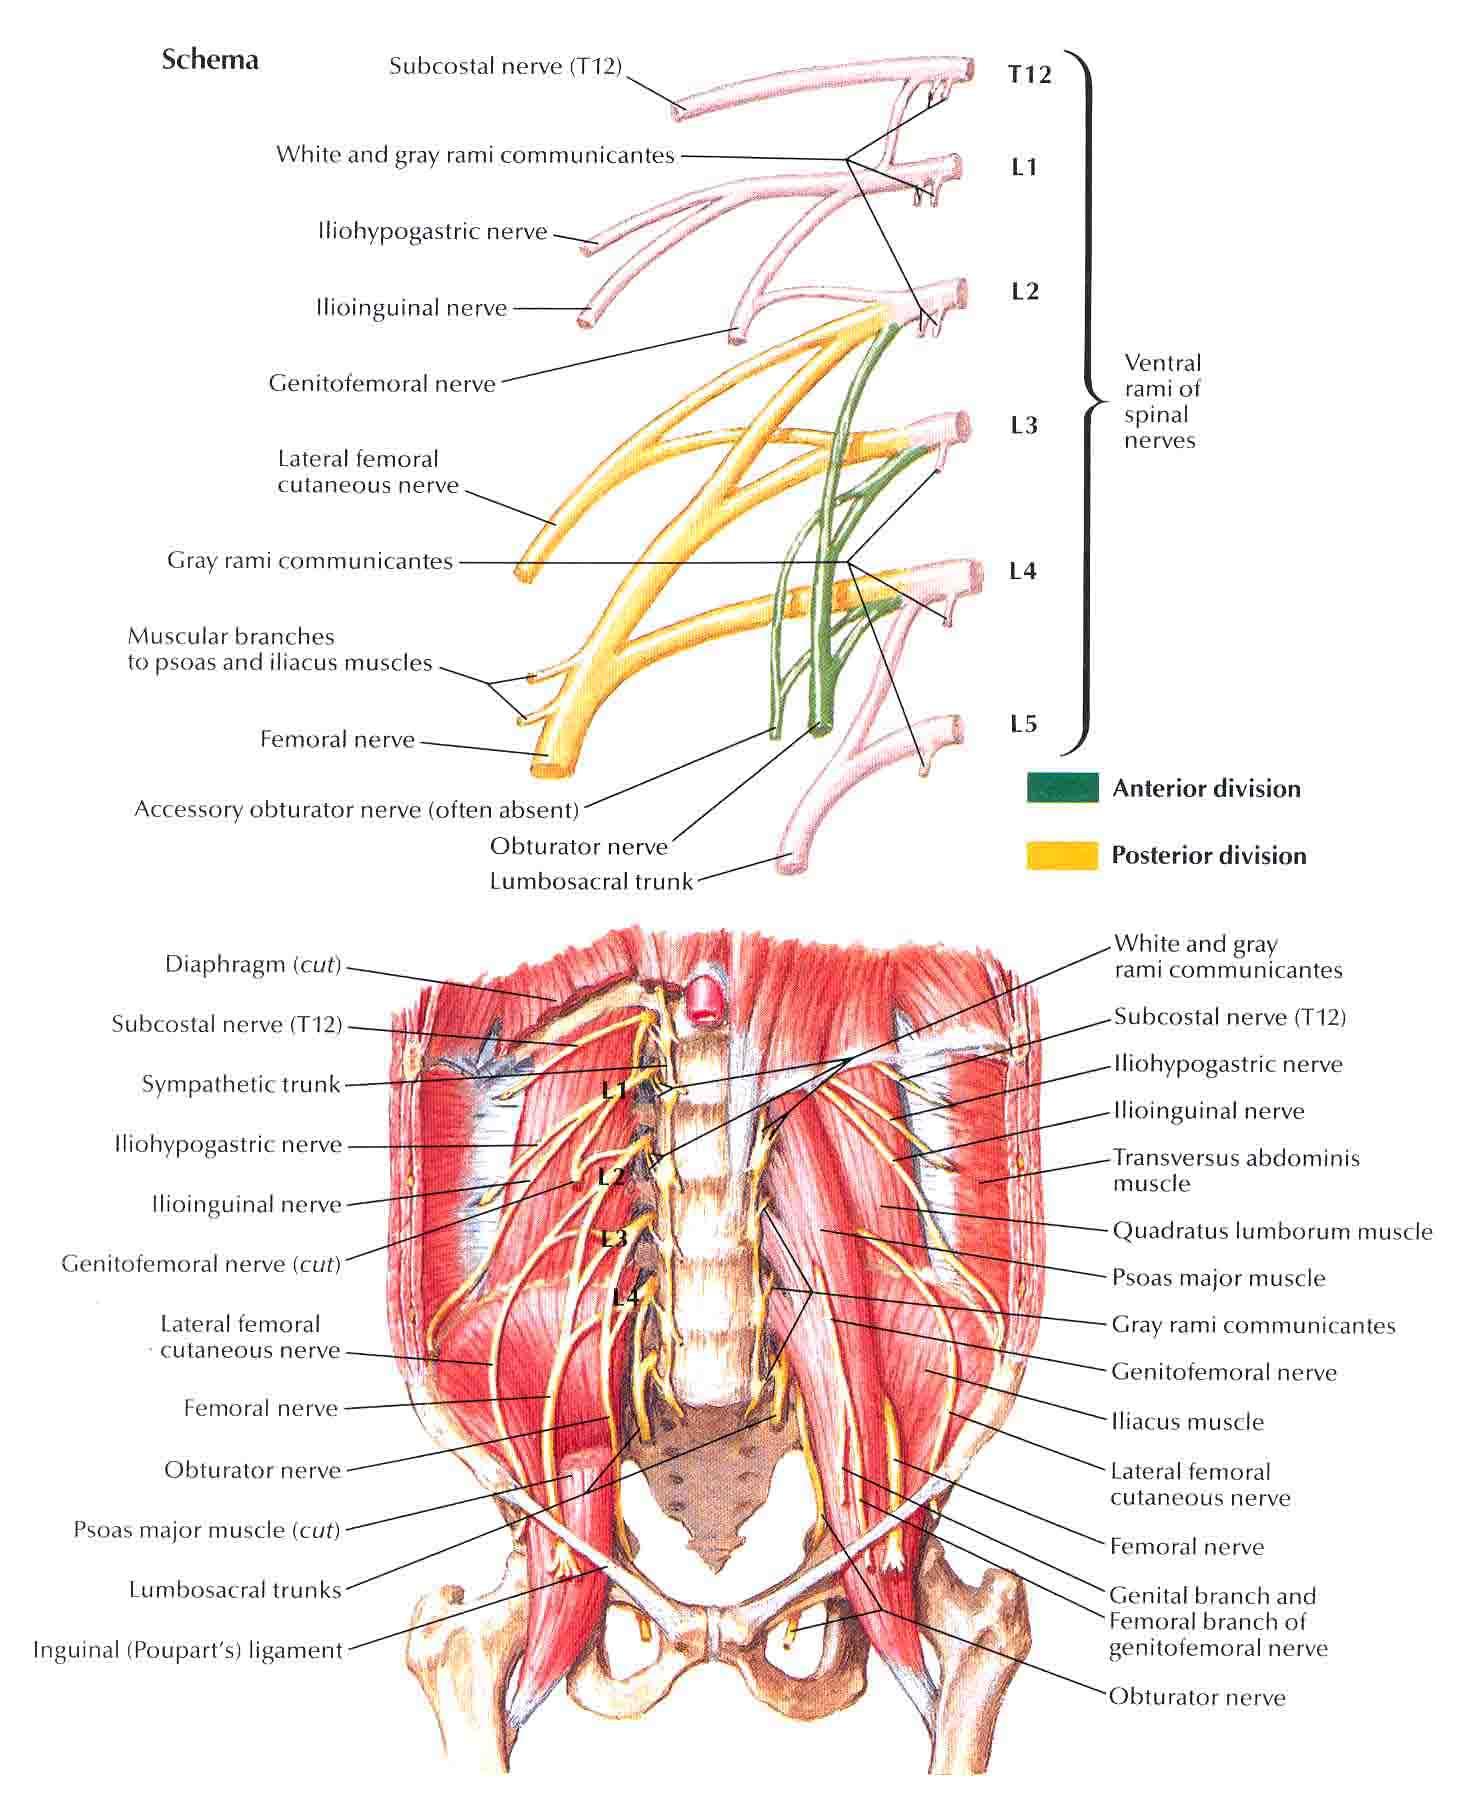 Treating Work-Related Brachial Plexus Injury with Nerve Transfer ...